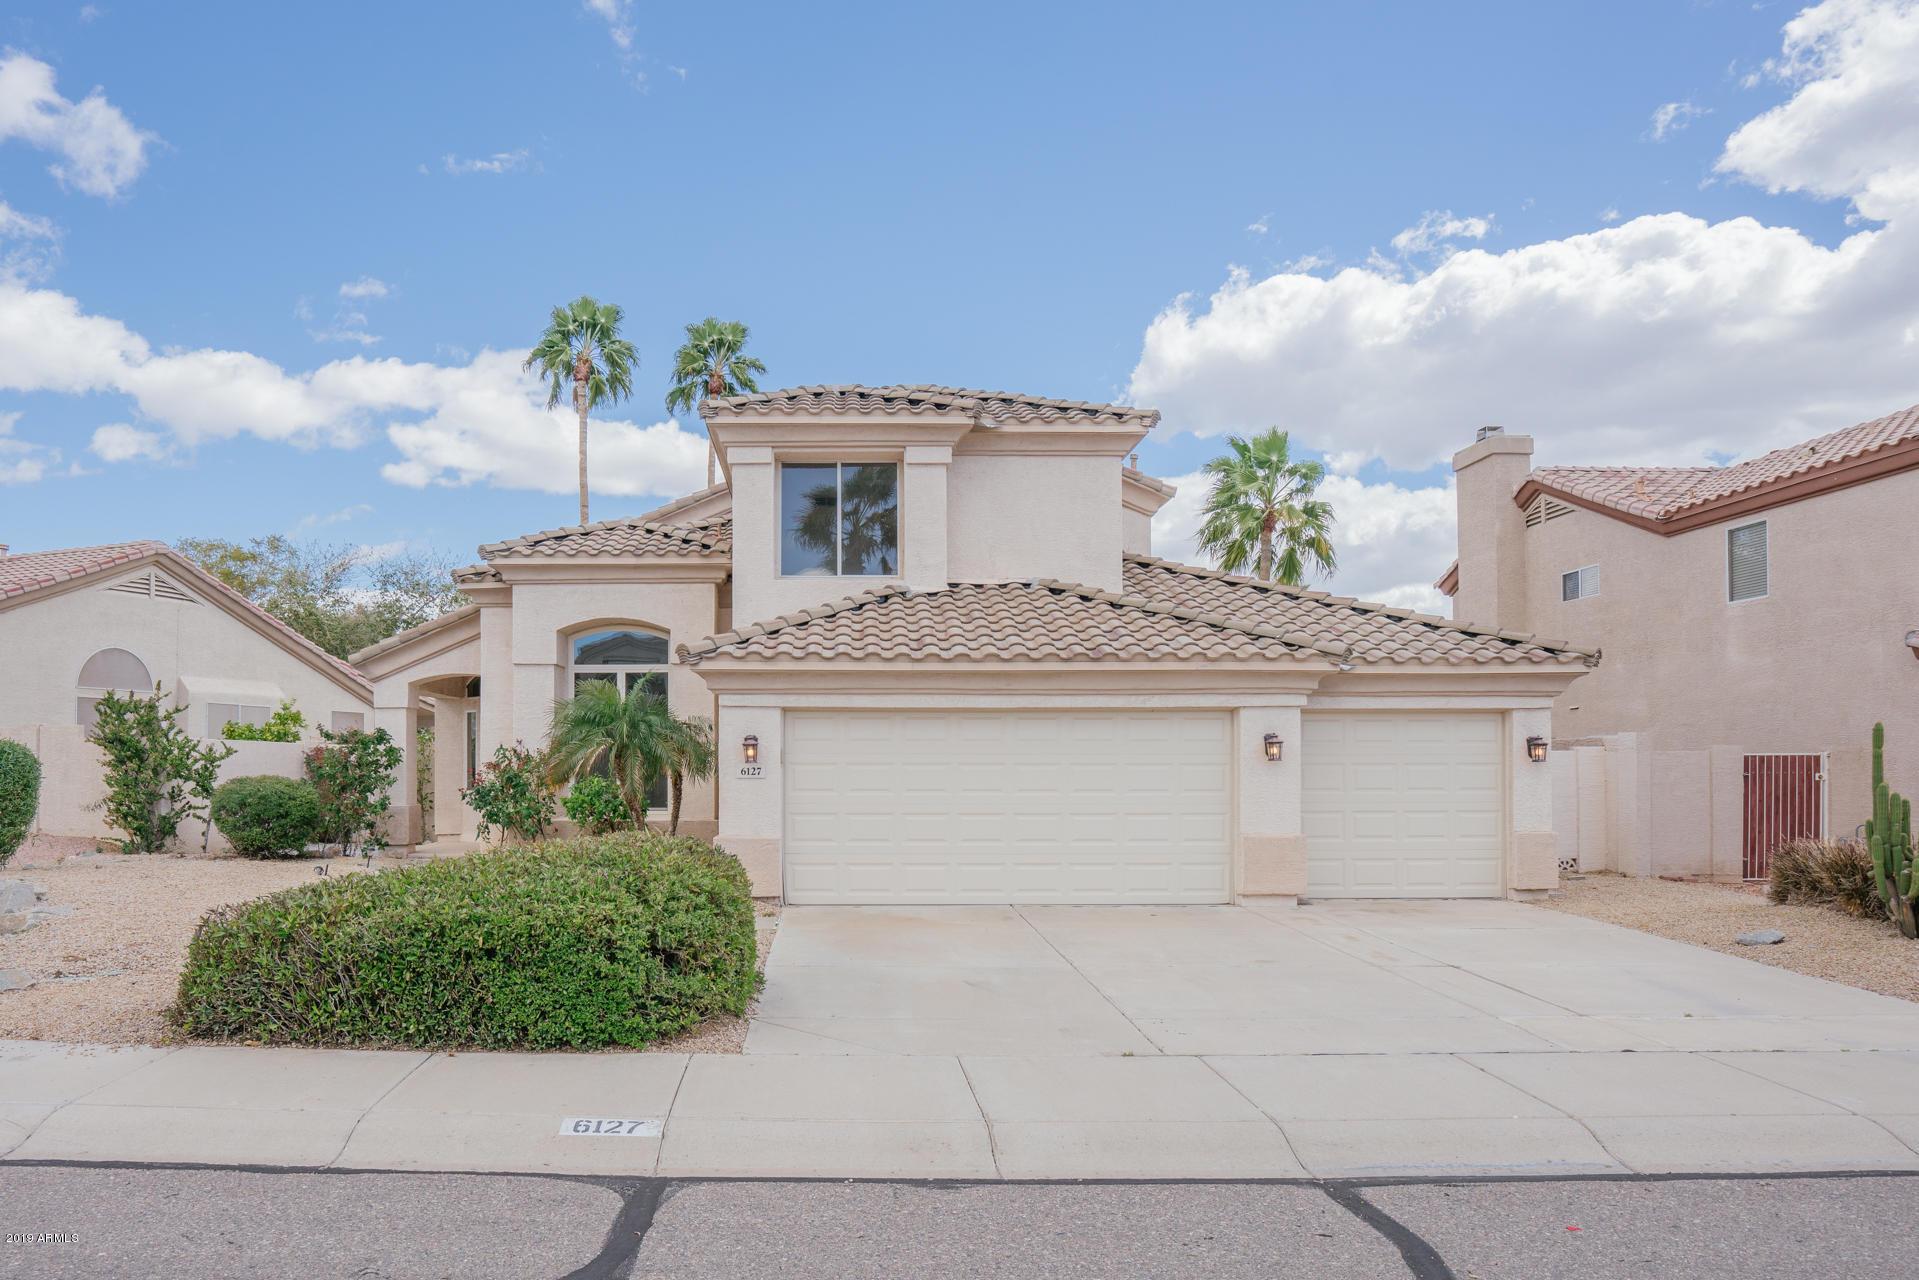 Photo of 6127 W IRMA Lane, Glendale, AZ 85308